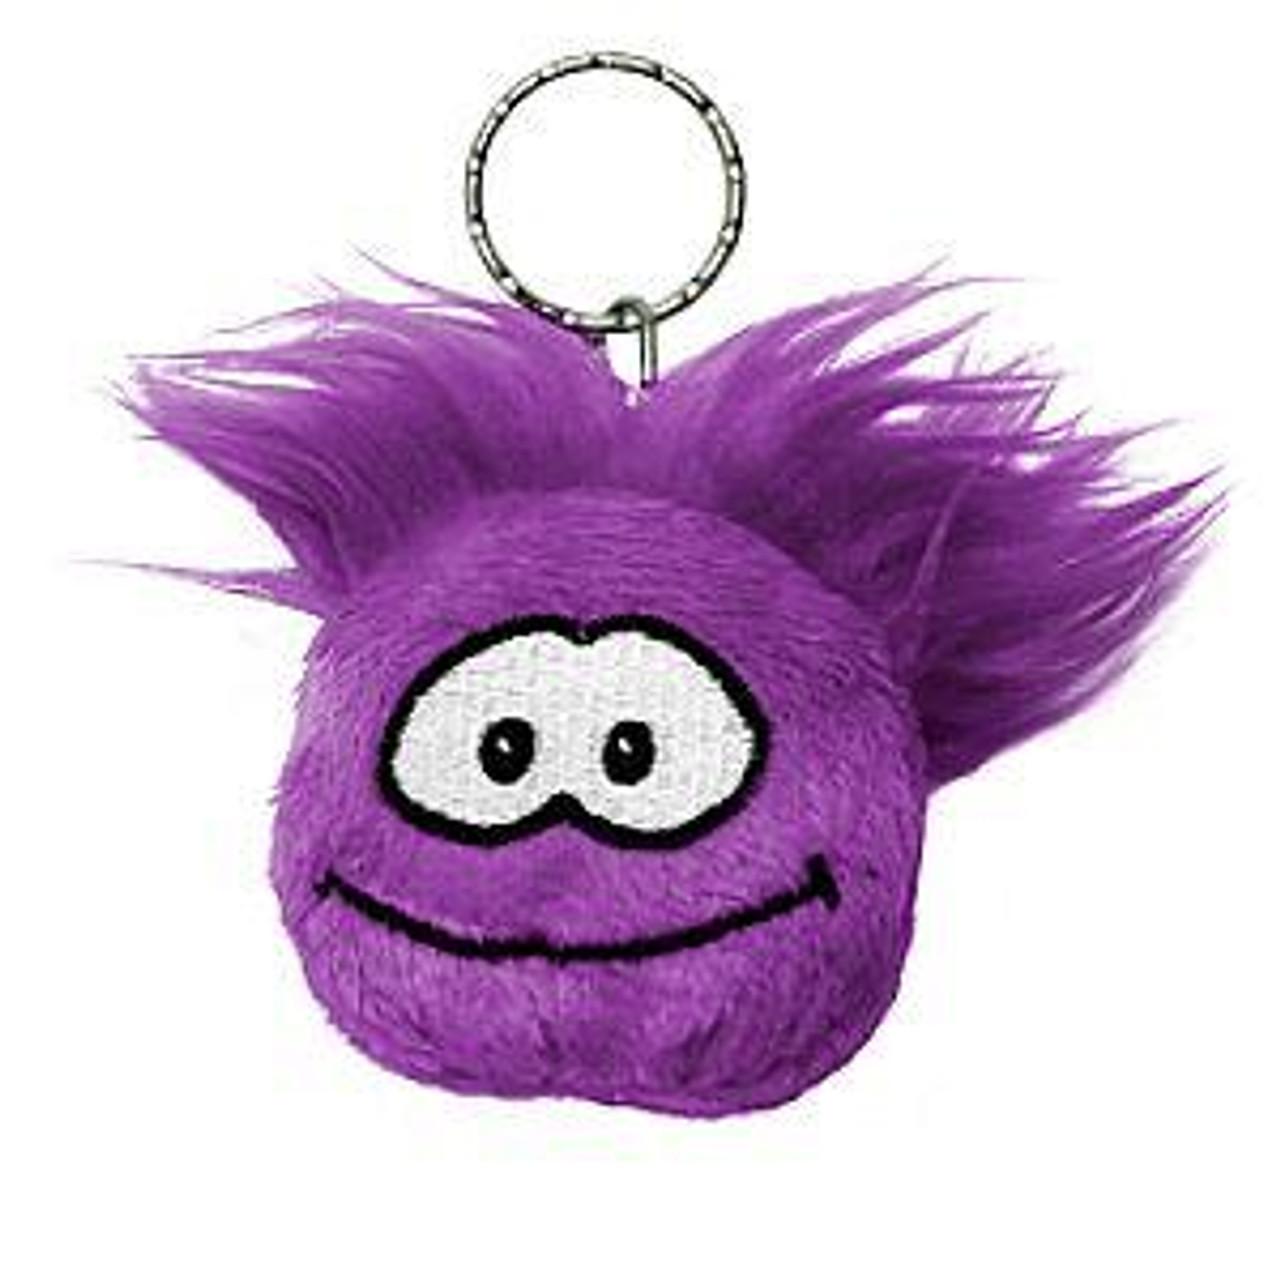 Club Penguin Purple Puffle 2-Inch Plush Keychain